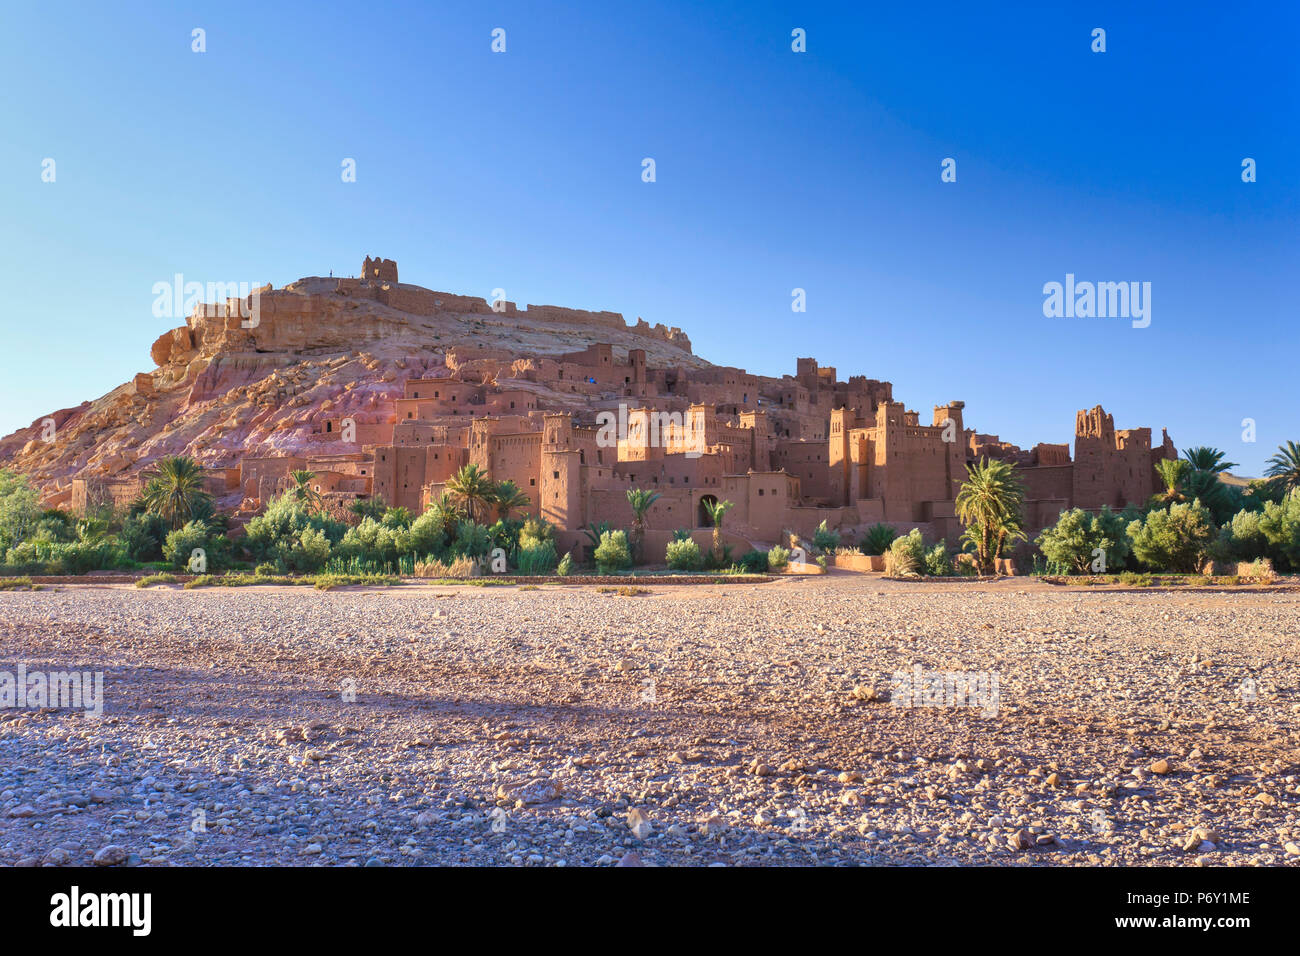 Marokko, Kasbah Ait Benhaddou Stockbild